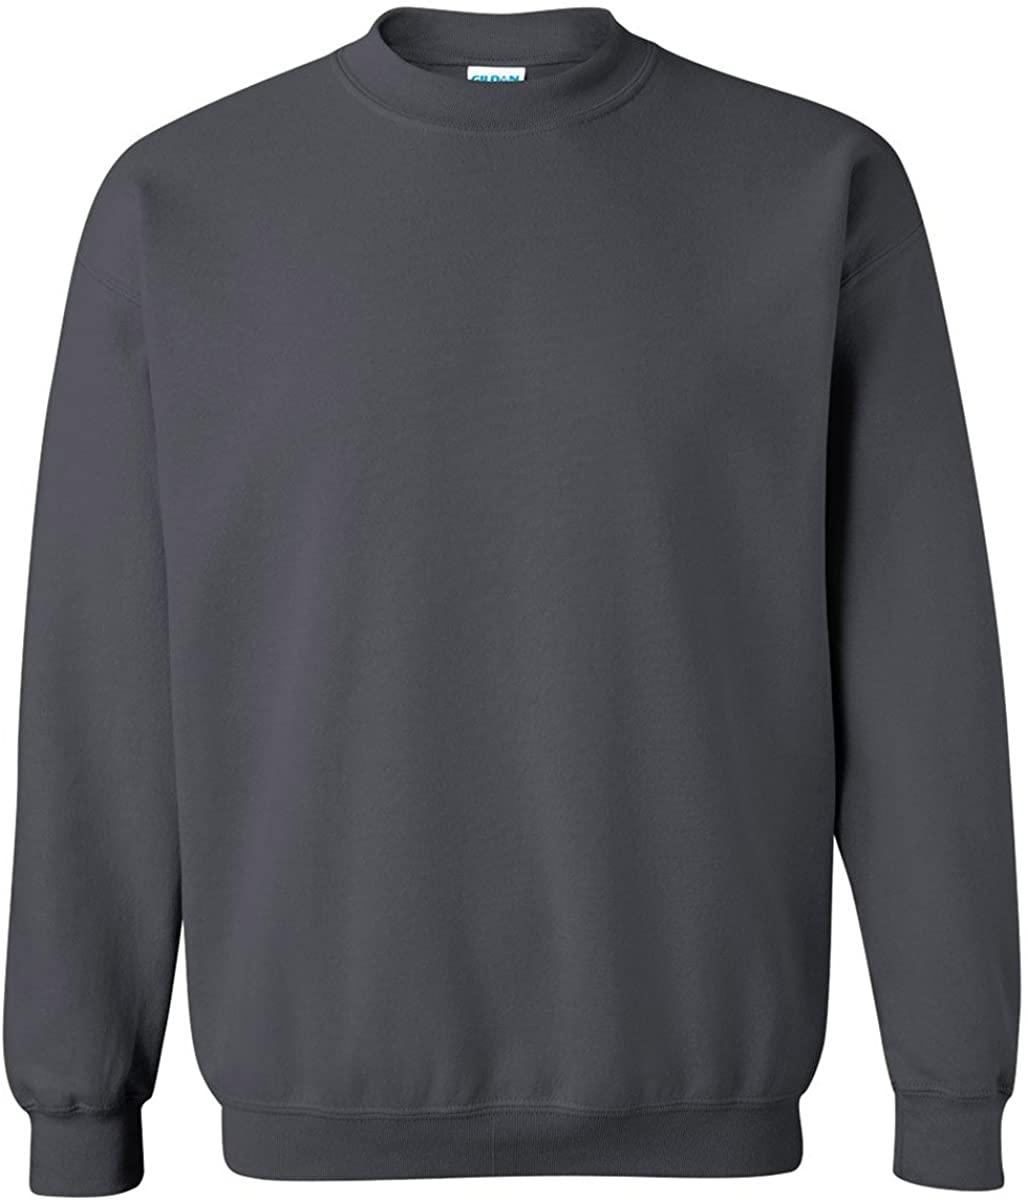 Gildan 18000 - Classic Fit Adult Crewneck Sweatshirt Heavy Blend - First Quality - Dark Heather - Small